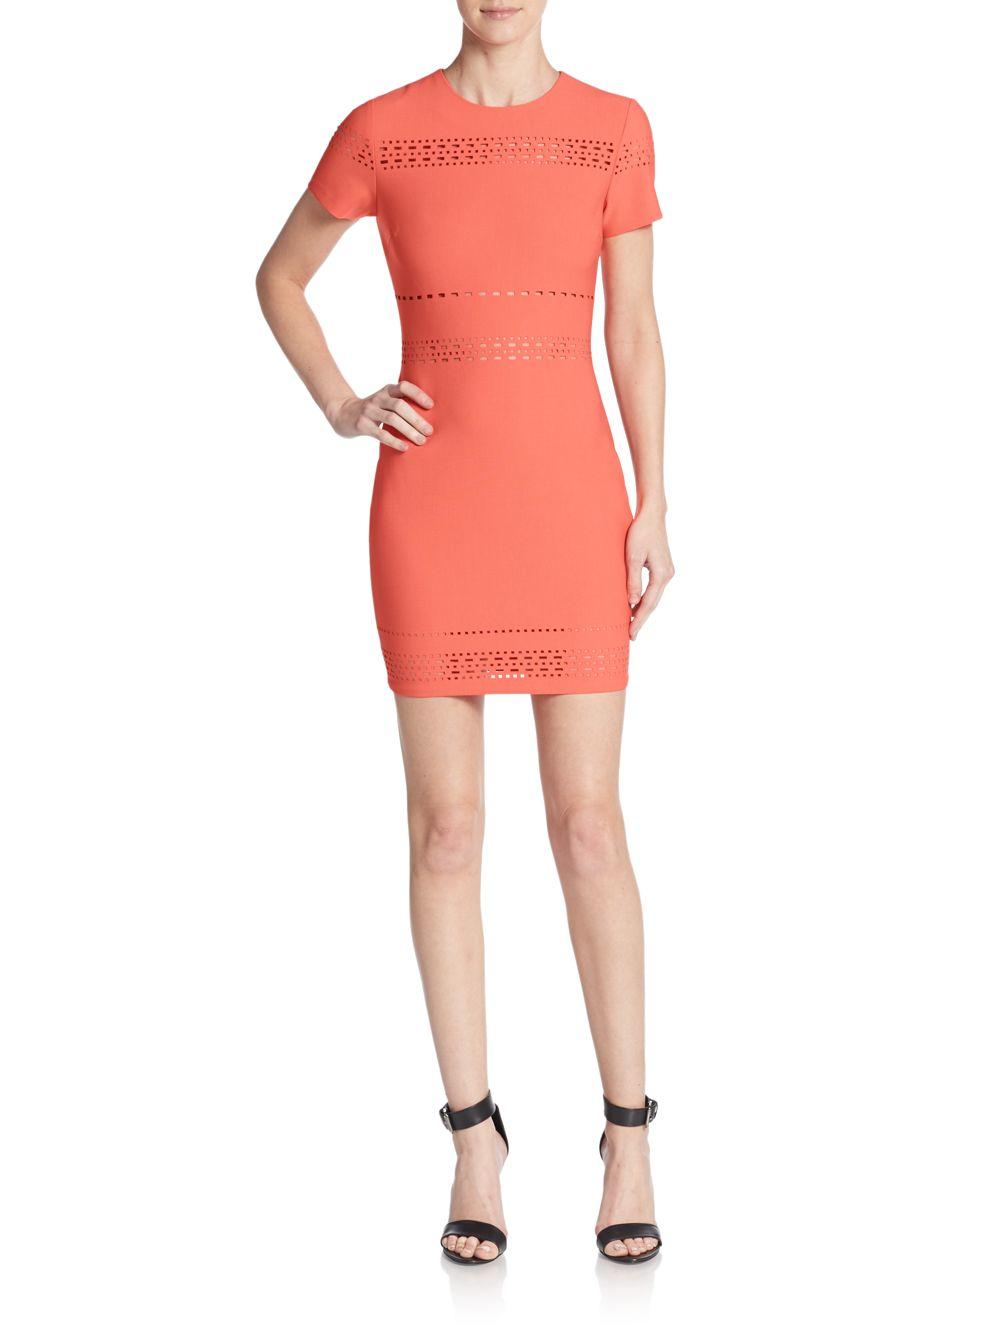 2a033b3394 Elizabeth and James Ari Perforated Sheath Dress in Red - Lyst